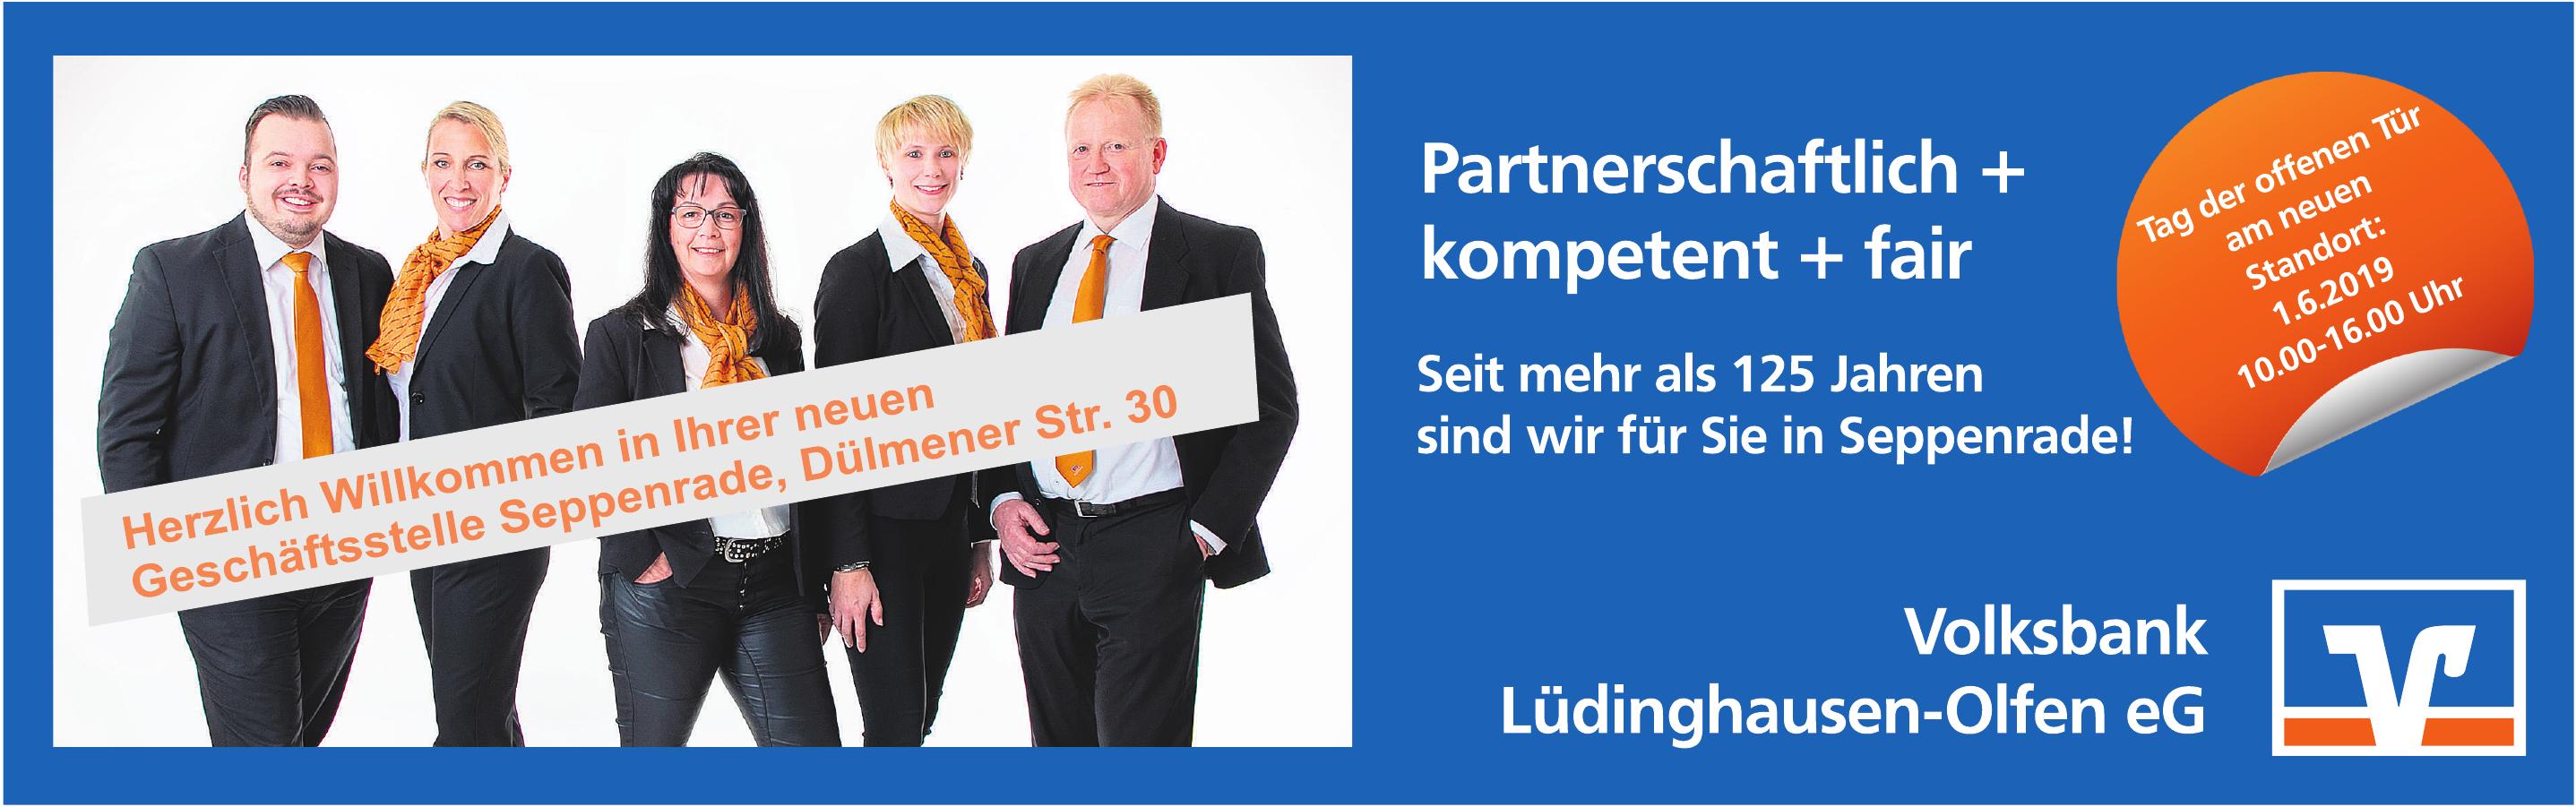 Volksbank Lüdinghausen-Olfen eG